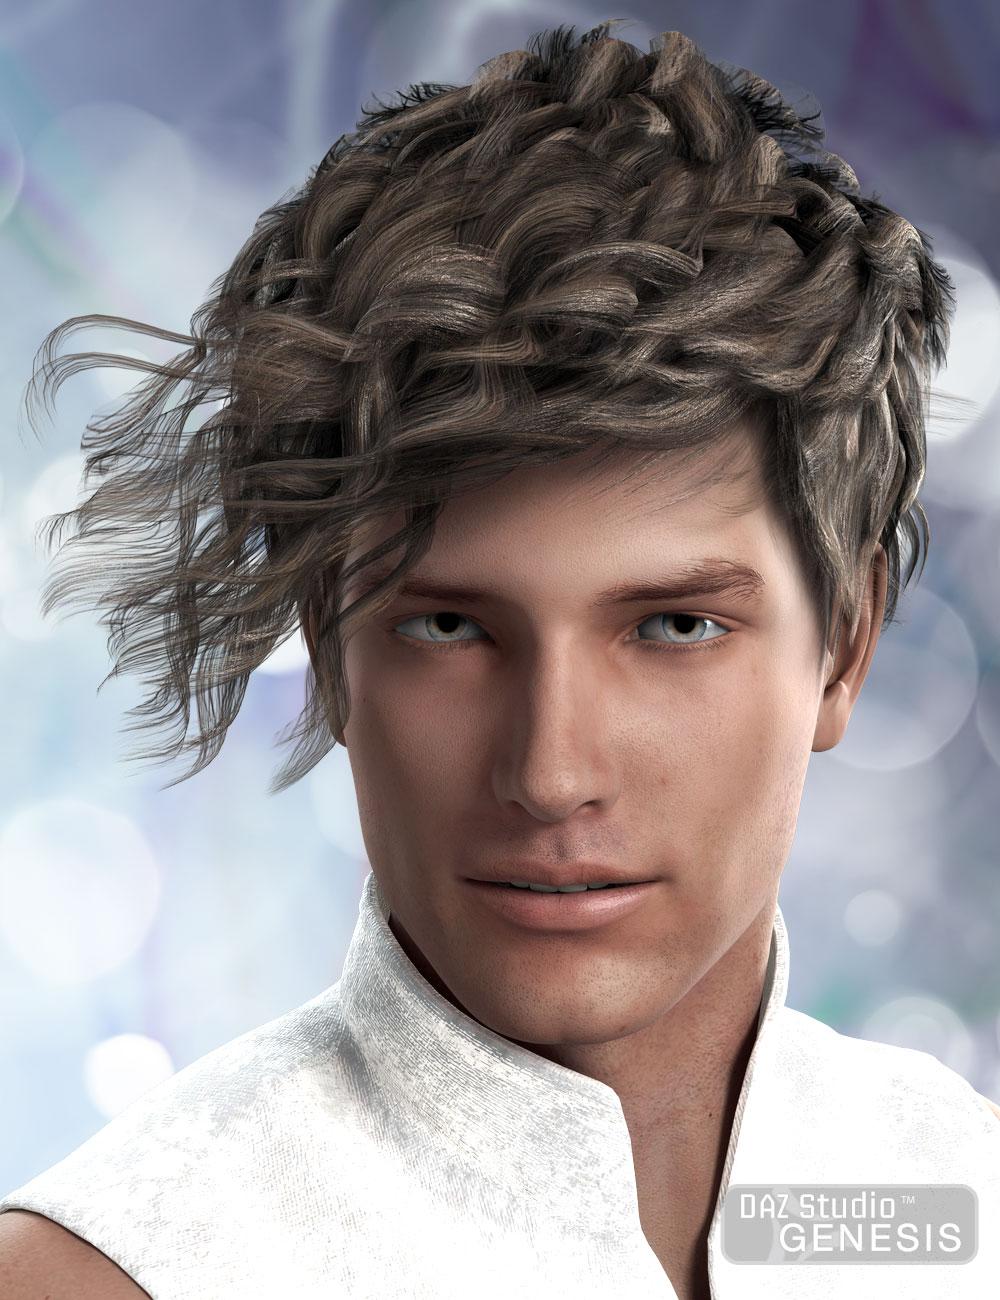 Sebastian Hair for Genesis by: AprilYSH, 3D Models by Daz 3D